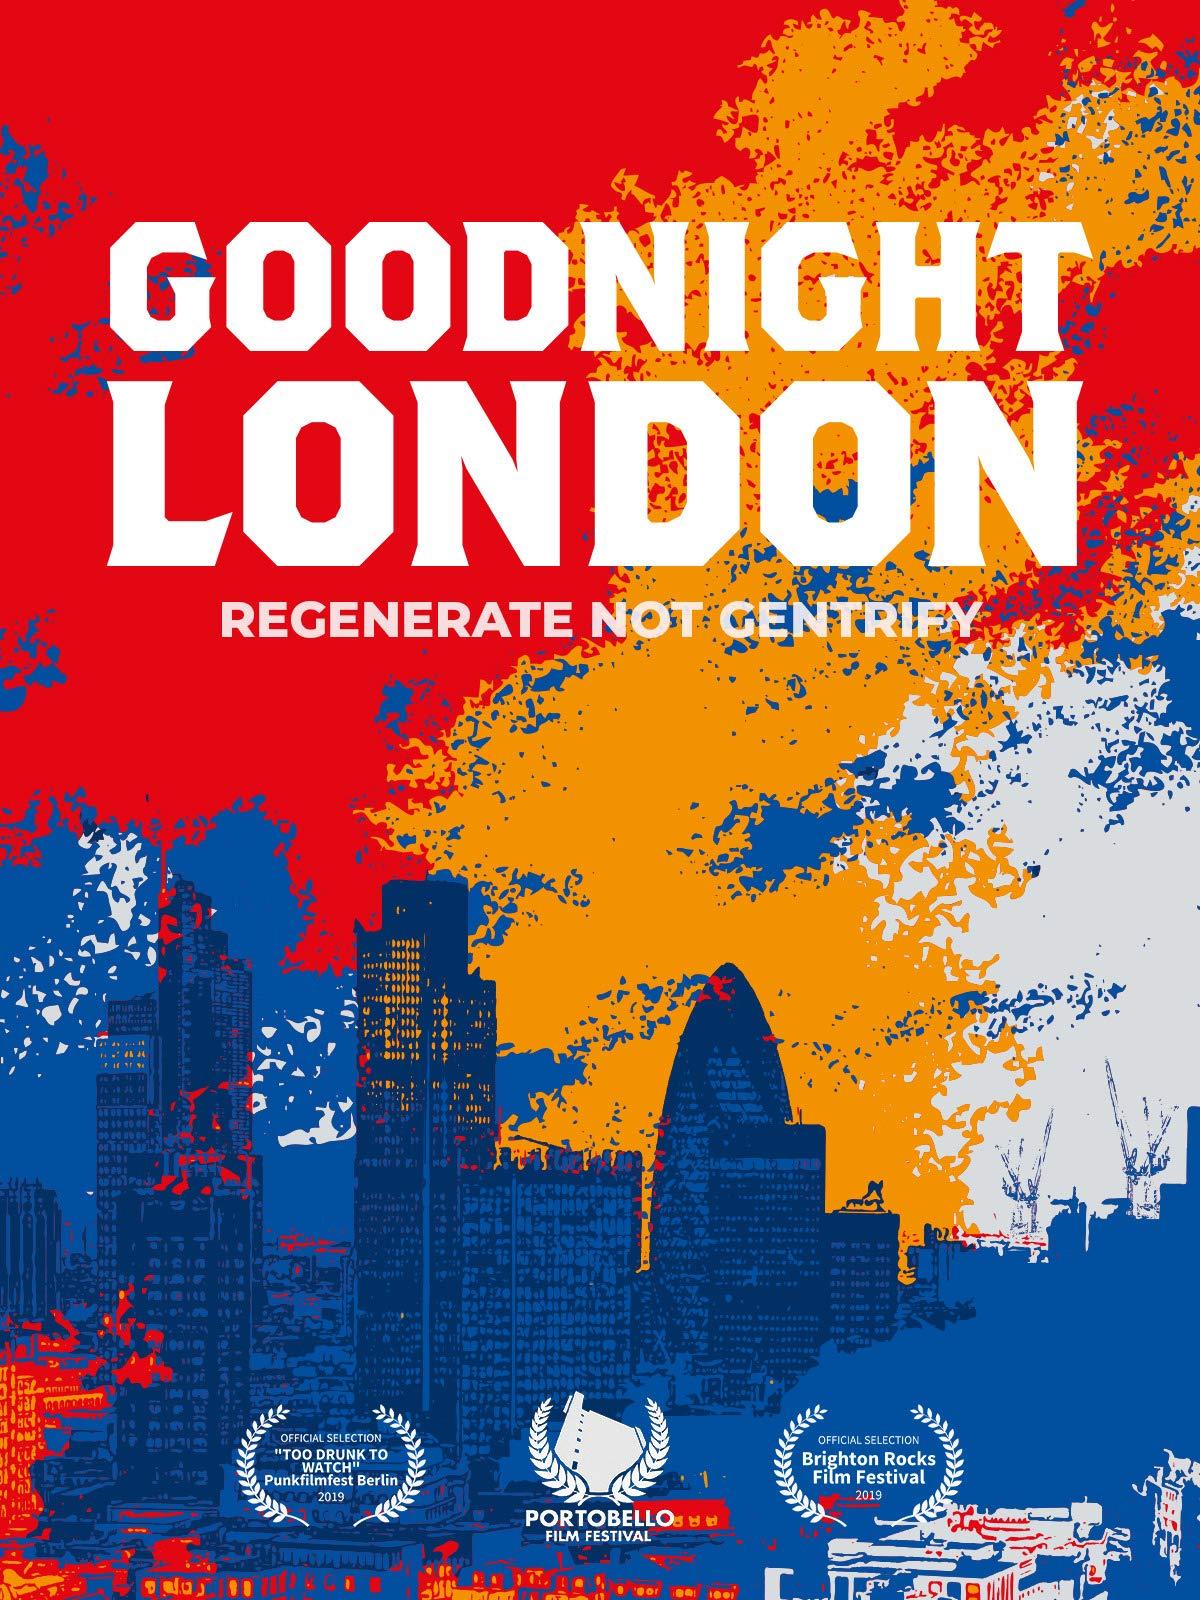 Goodnight London